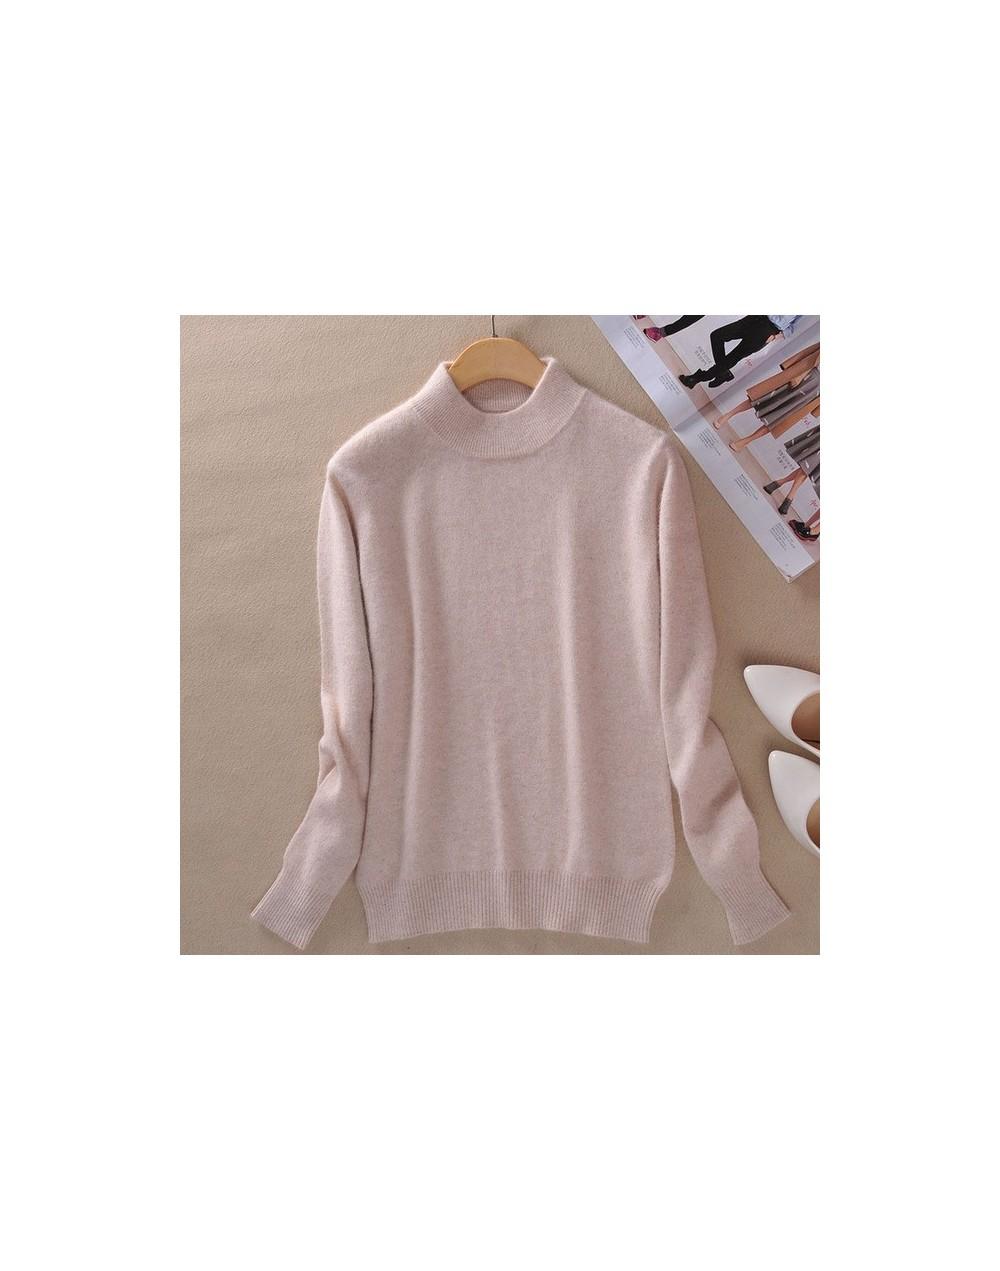 2018 Women Cashmere WooL Blend Sweater And Pullover Long Sleeve Knitted Half Turtleneck Pullover Women Winter Knit-wear Swea...